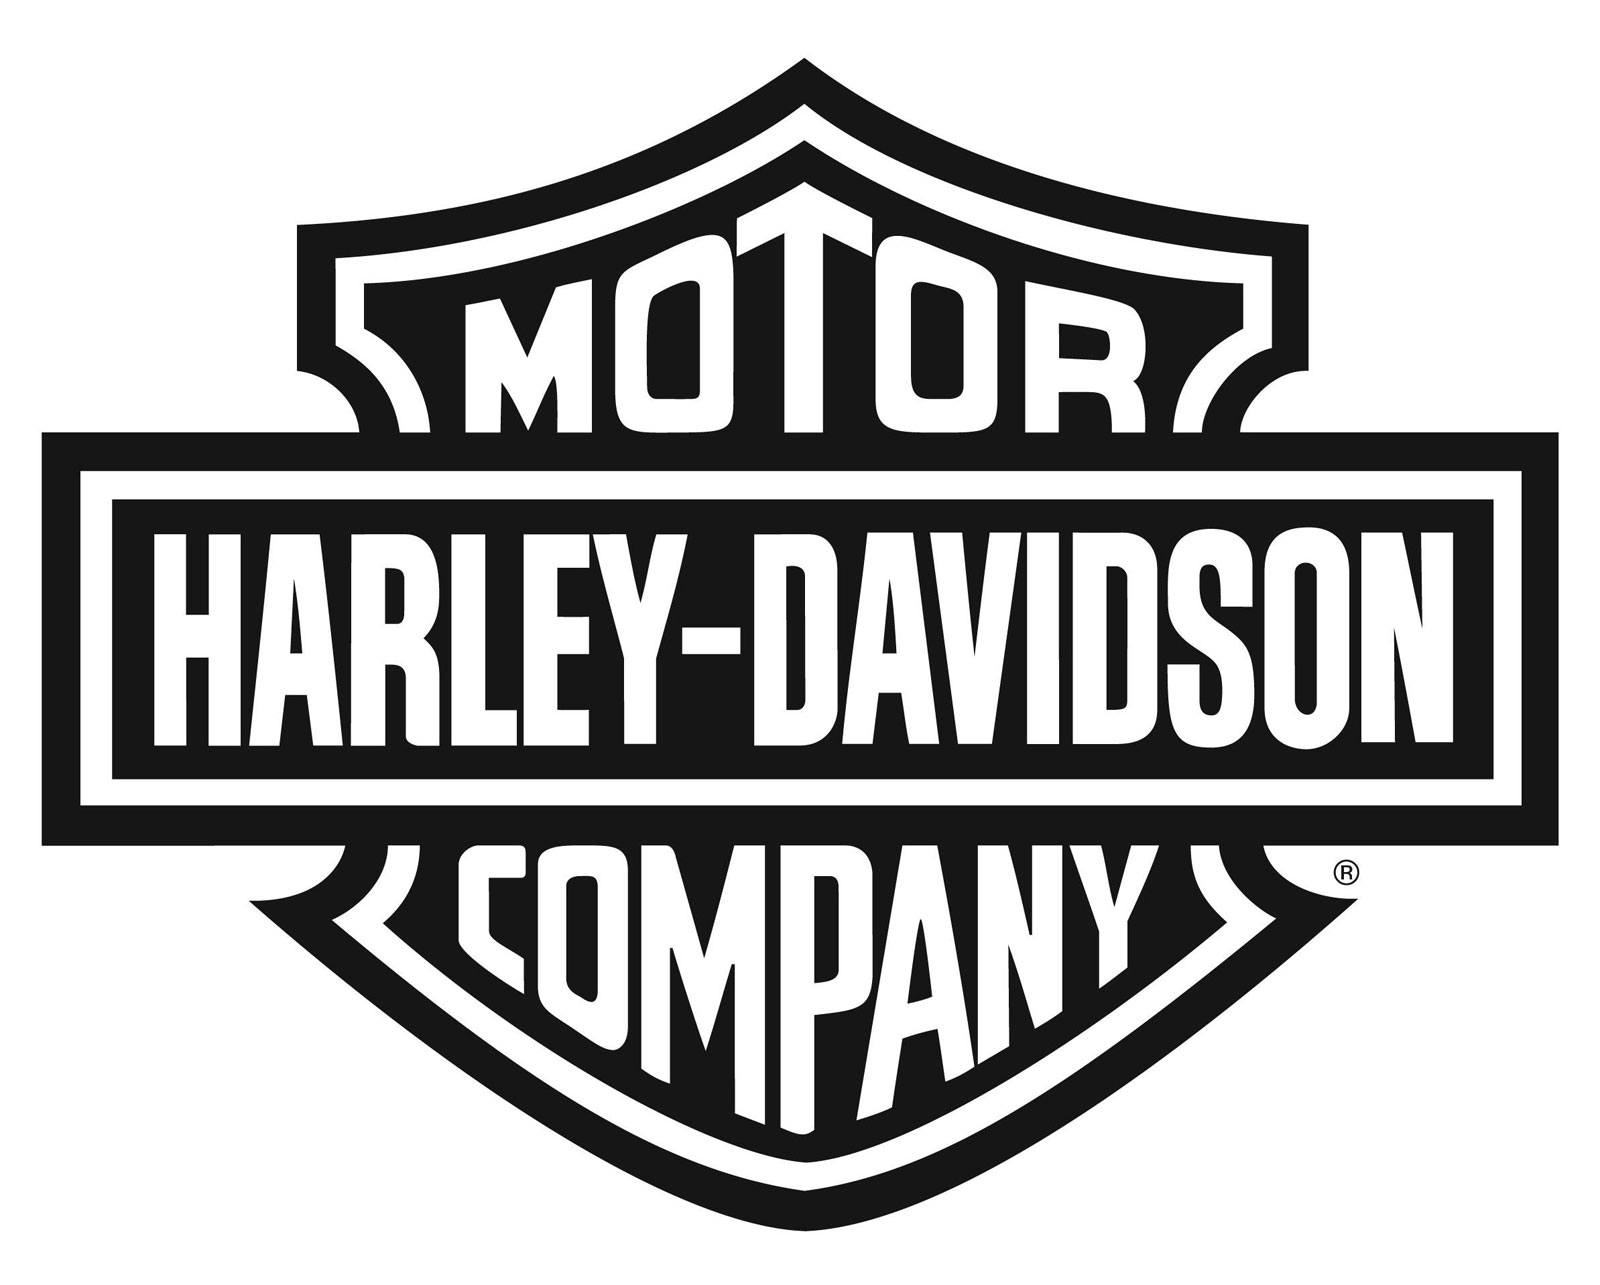 harley logo black and white vector | harley davidson | pinterest